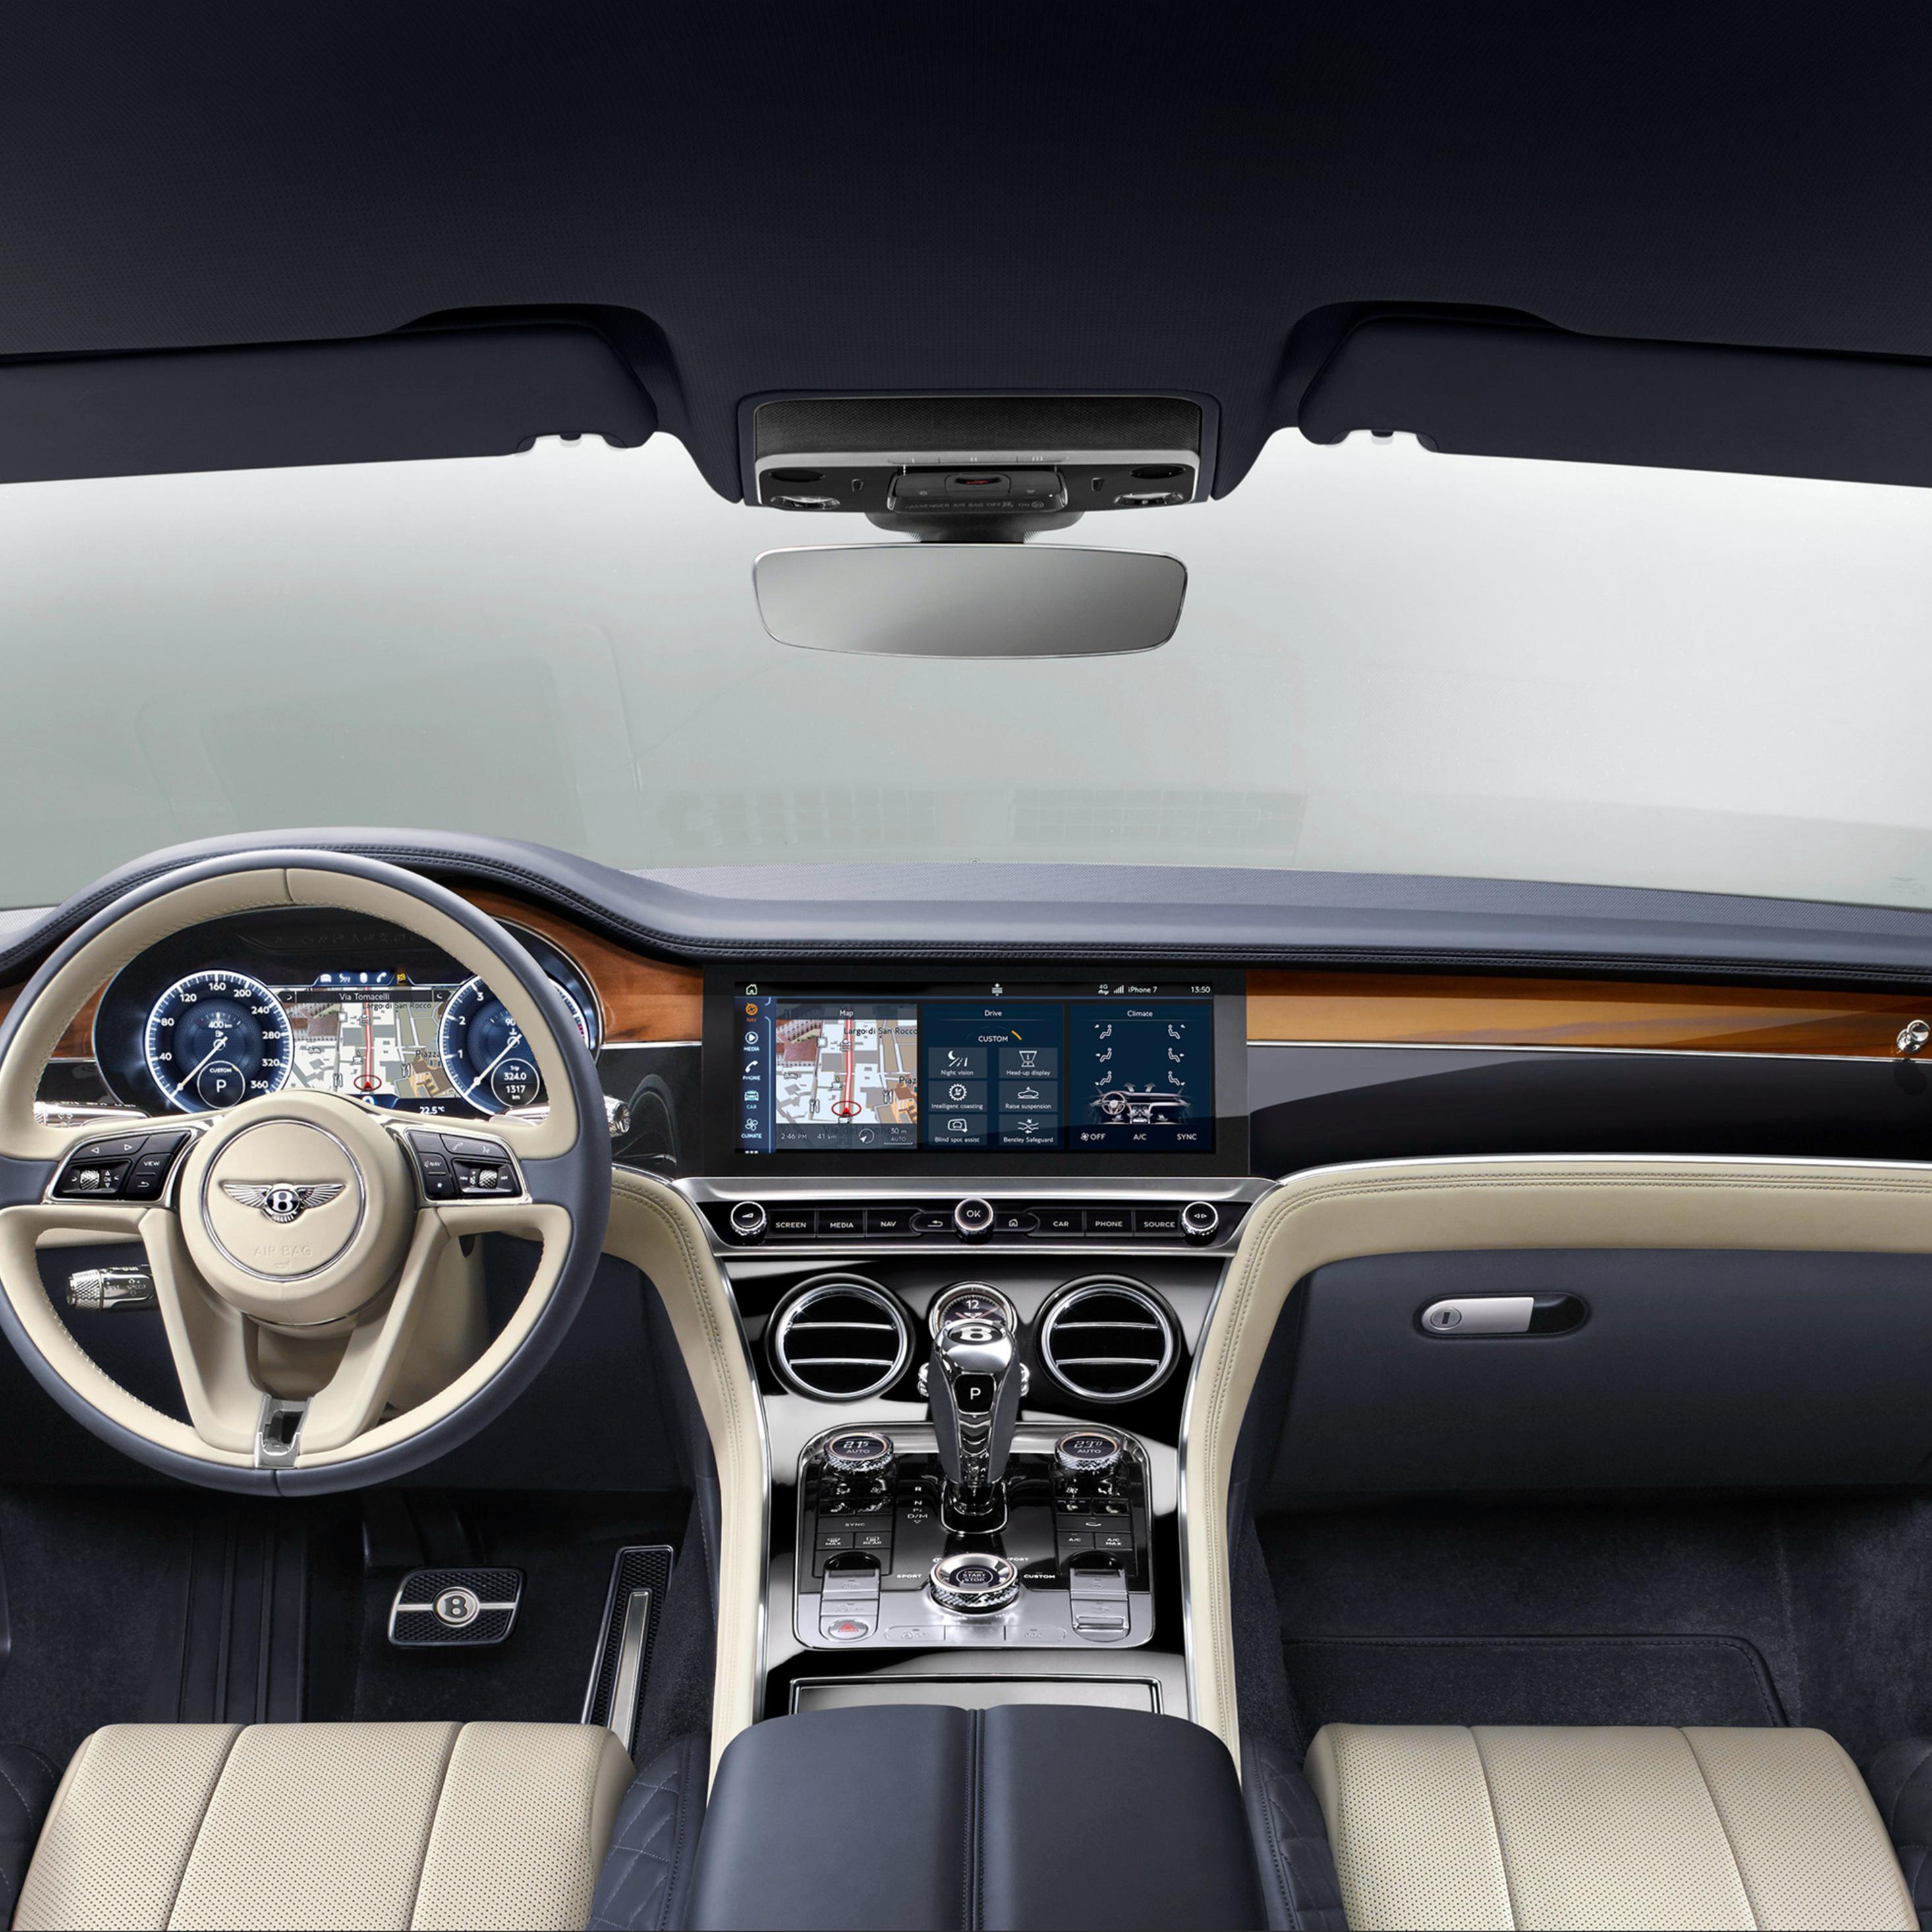 2932x2932 Bentley Continental GT 2017 Interior Ipad Pro